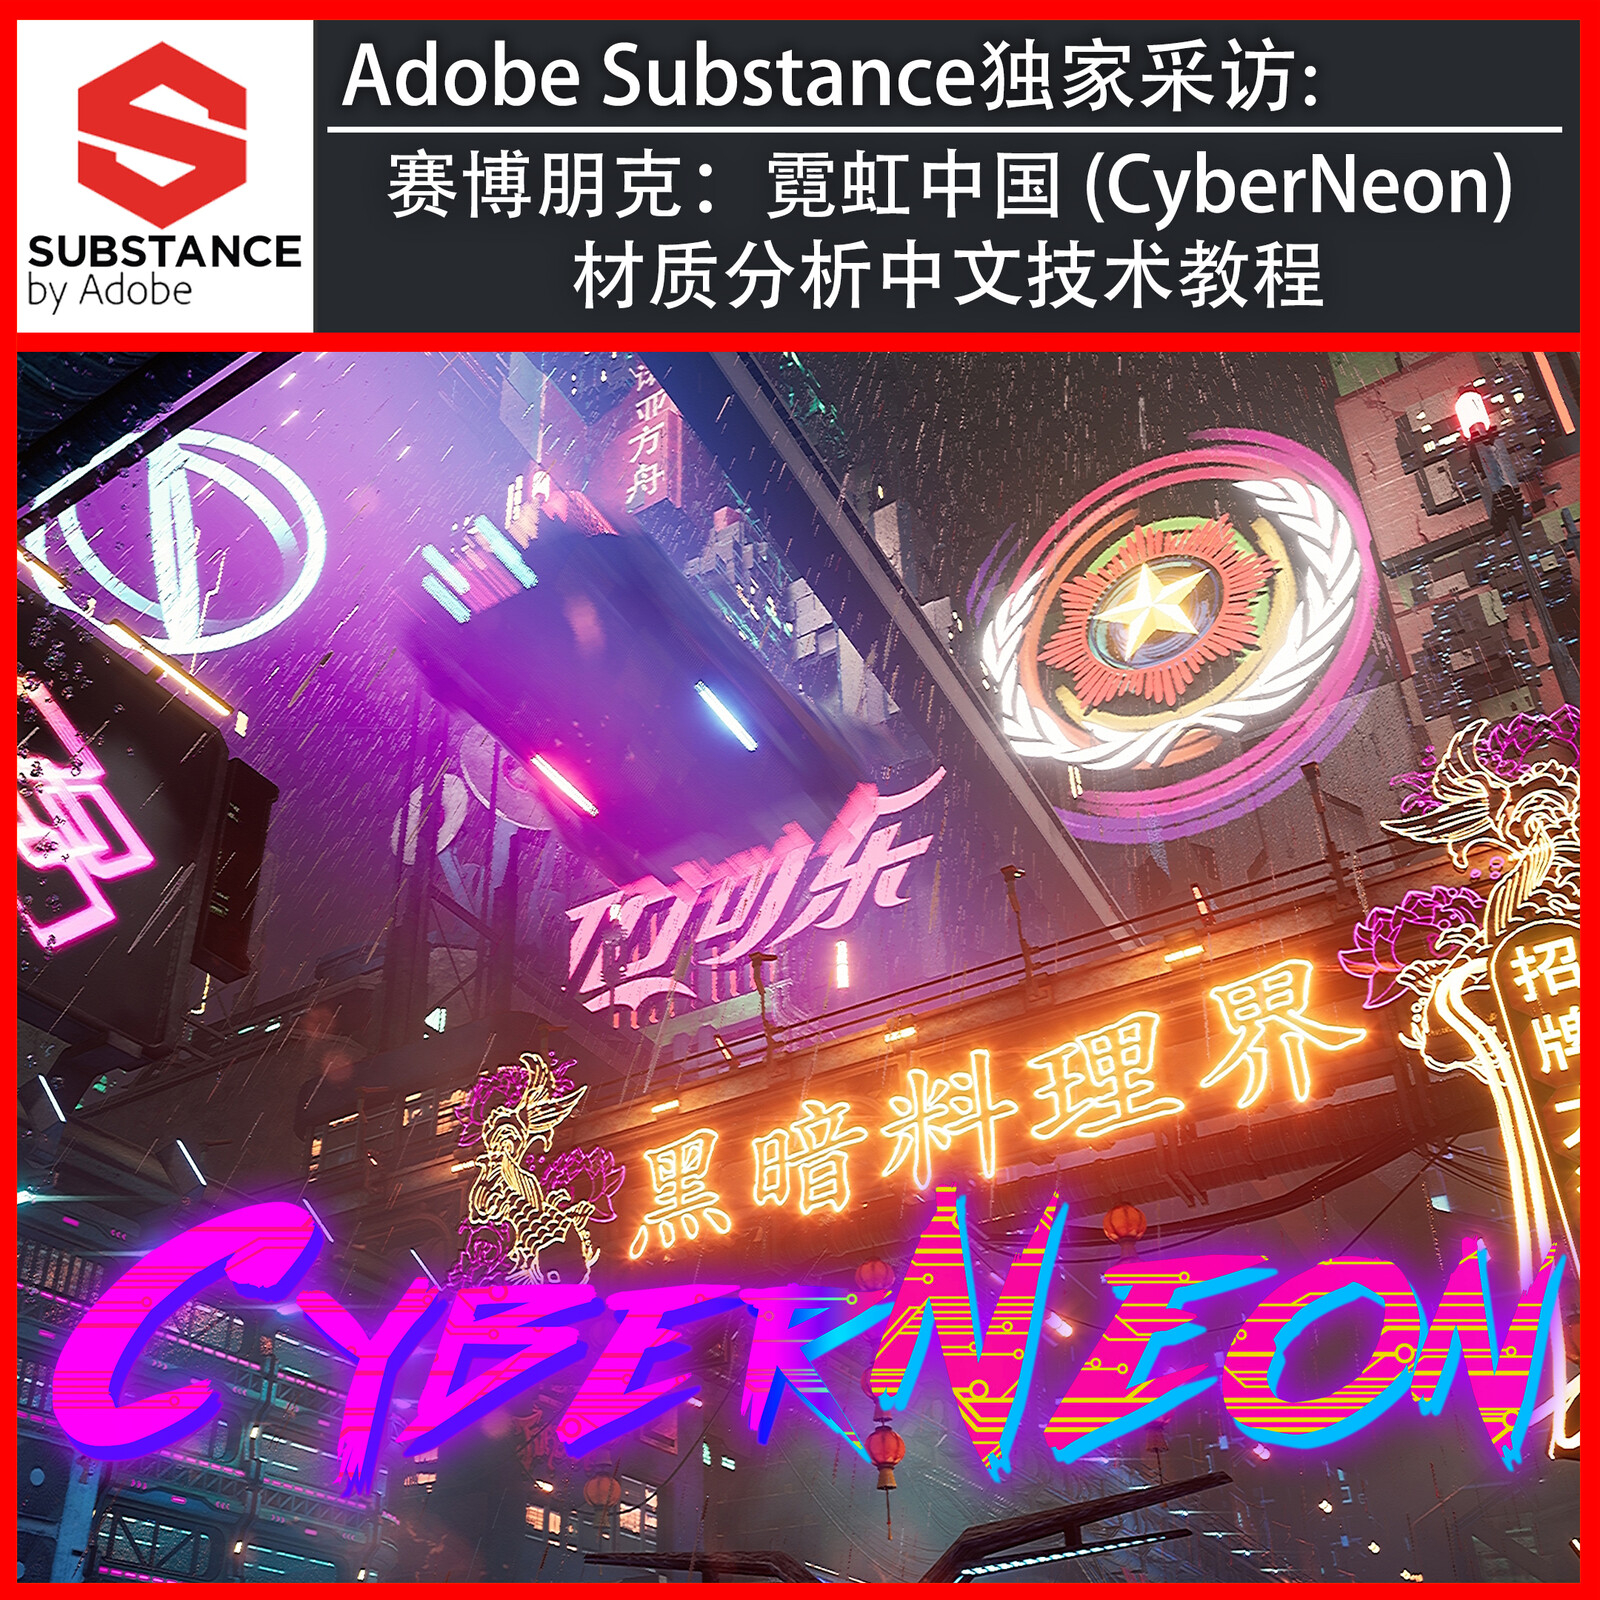 Adobe Substance 虚幻4引擎个人独家专访赛博朋克: 霓虹中国(CyberNeon) 材质分析中文技术教程